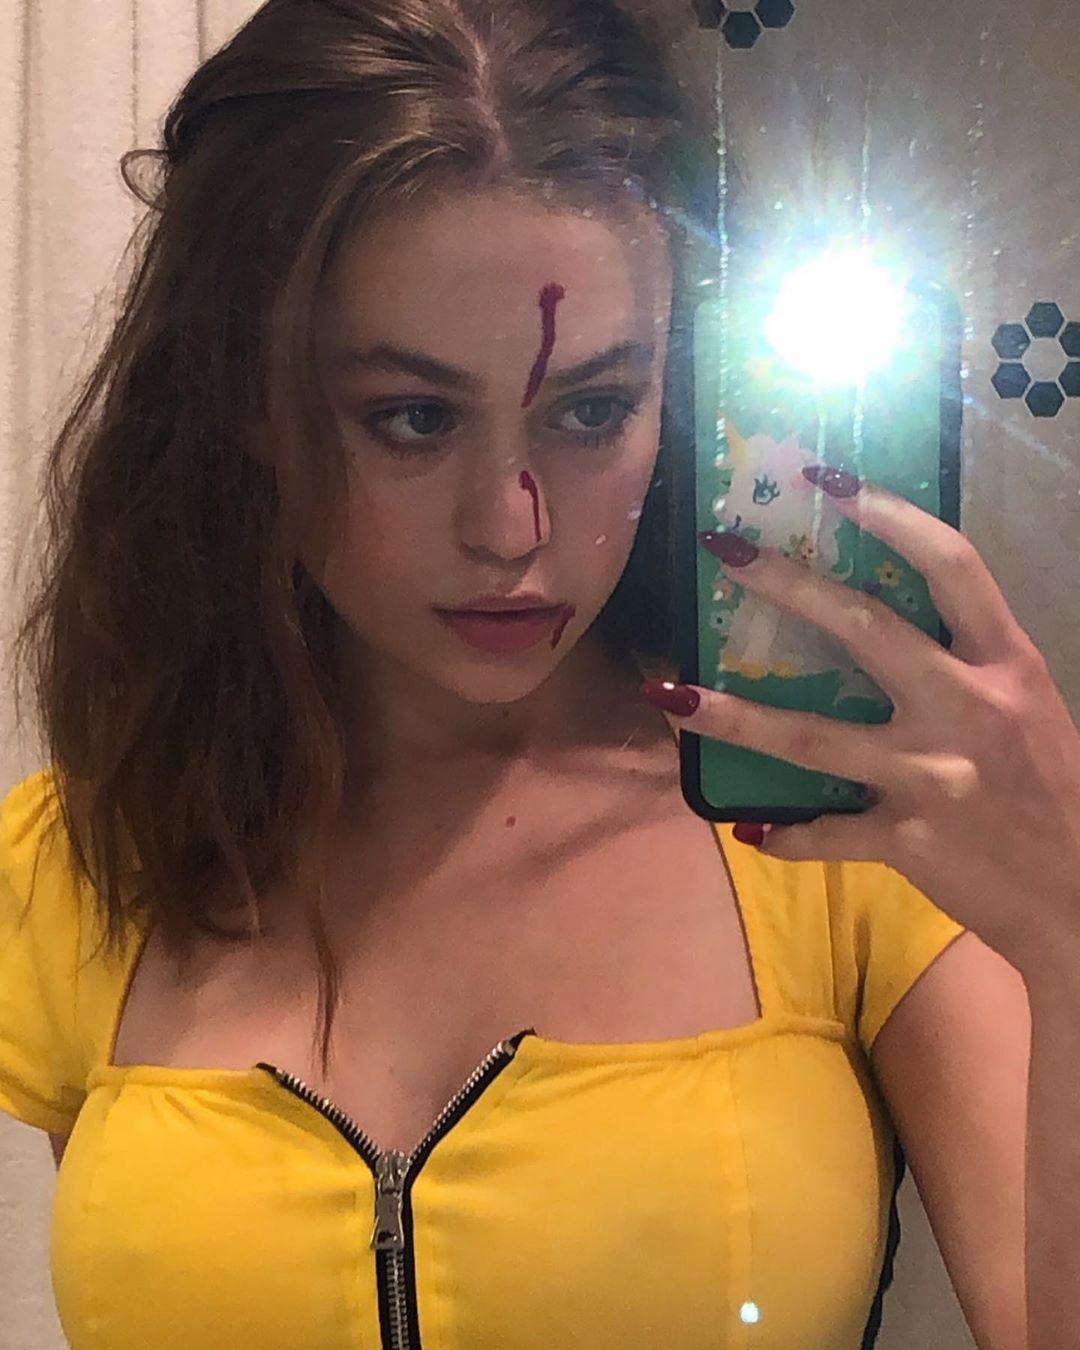 Nackt model instagram Abigail Ratchford: